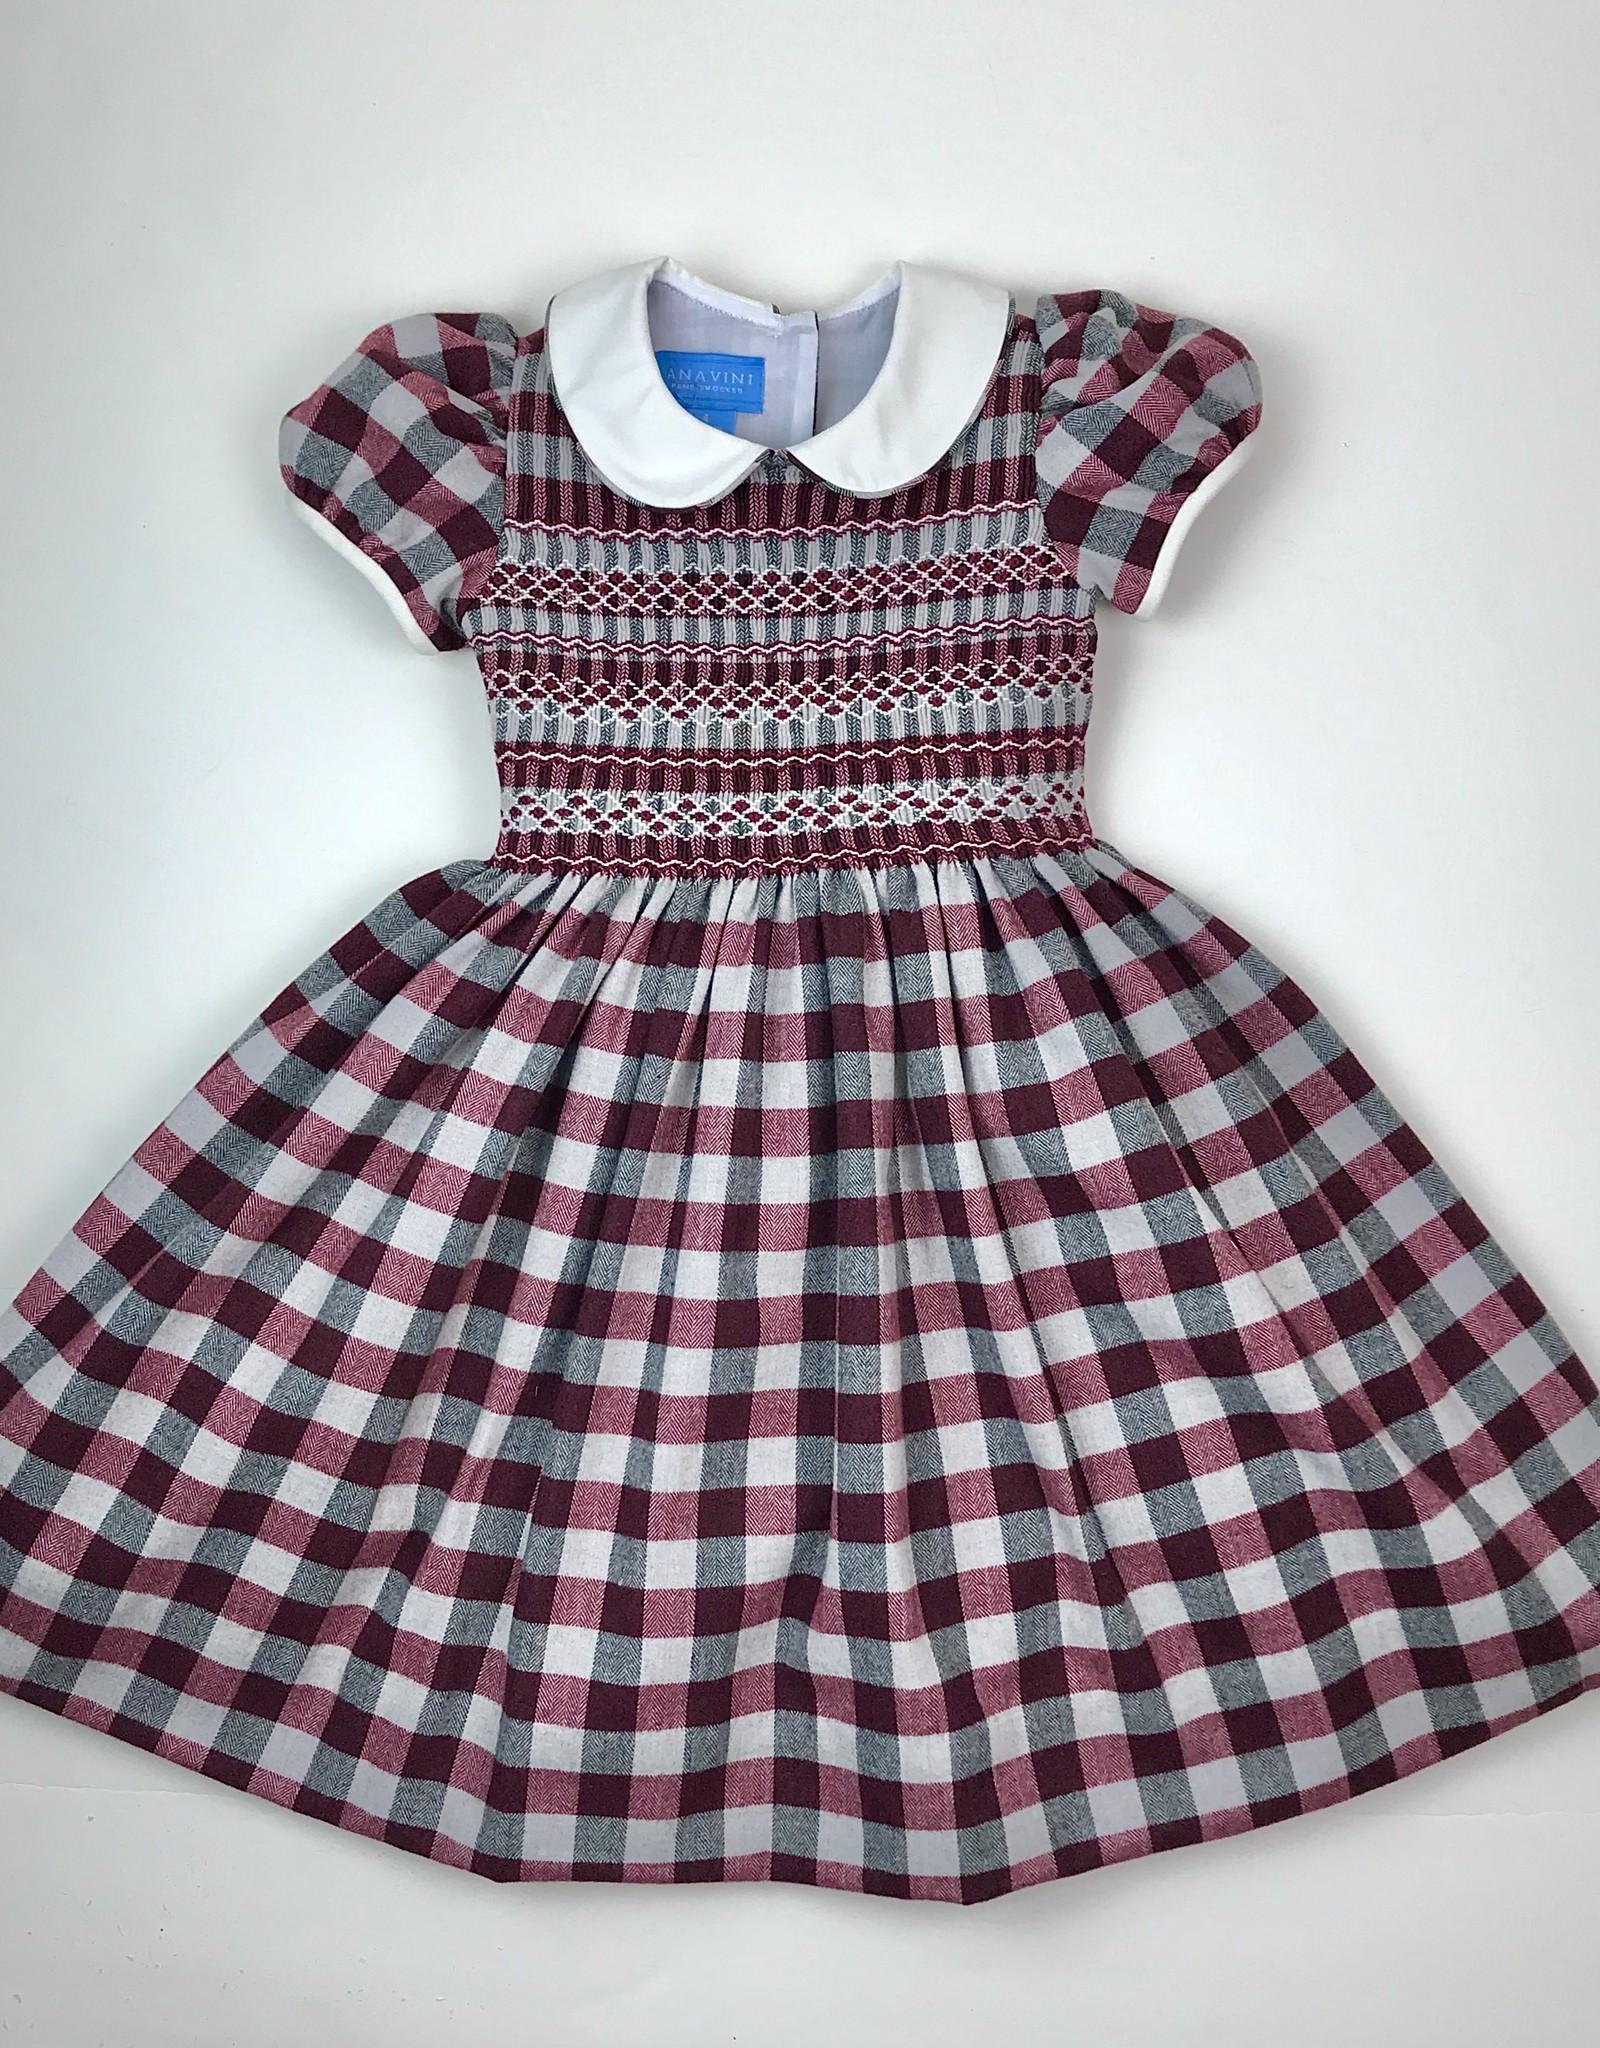 Anavini Burgundy/Gray Plaid Smocked Dress w/Collar